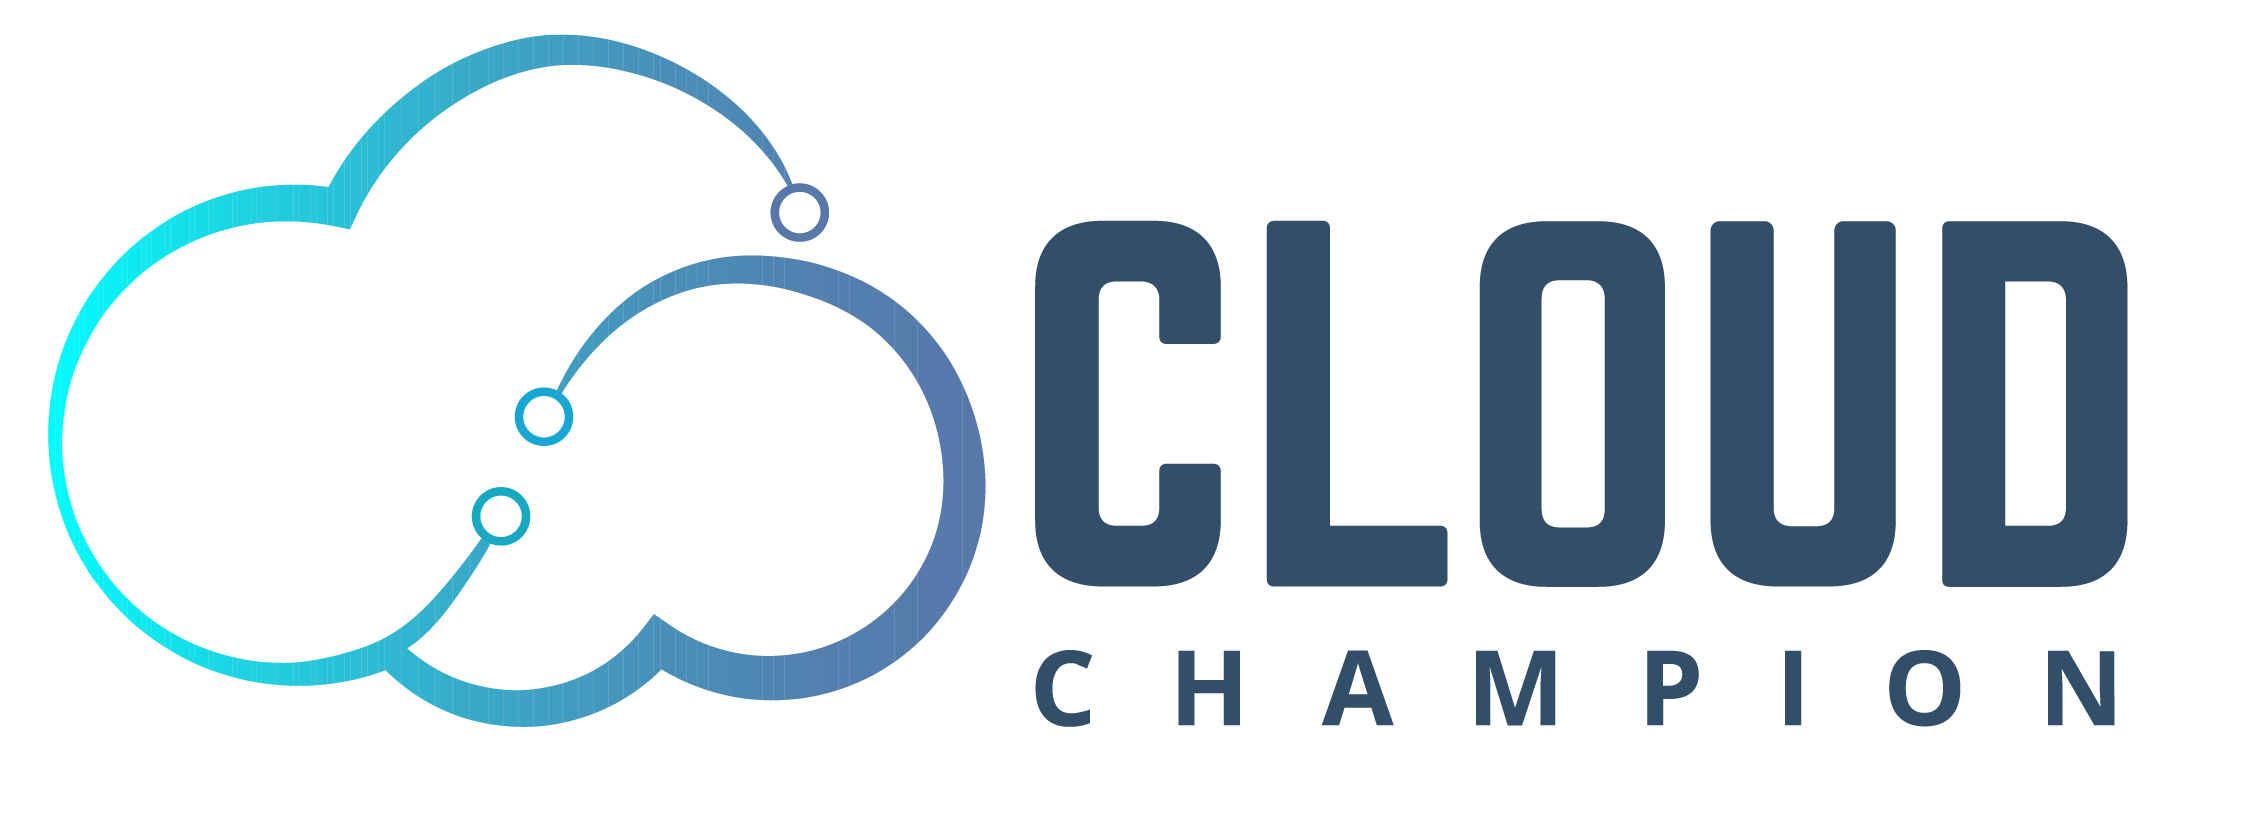 CloudChampion